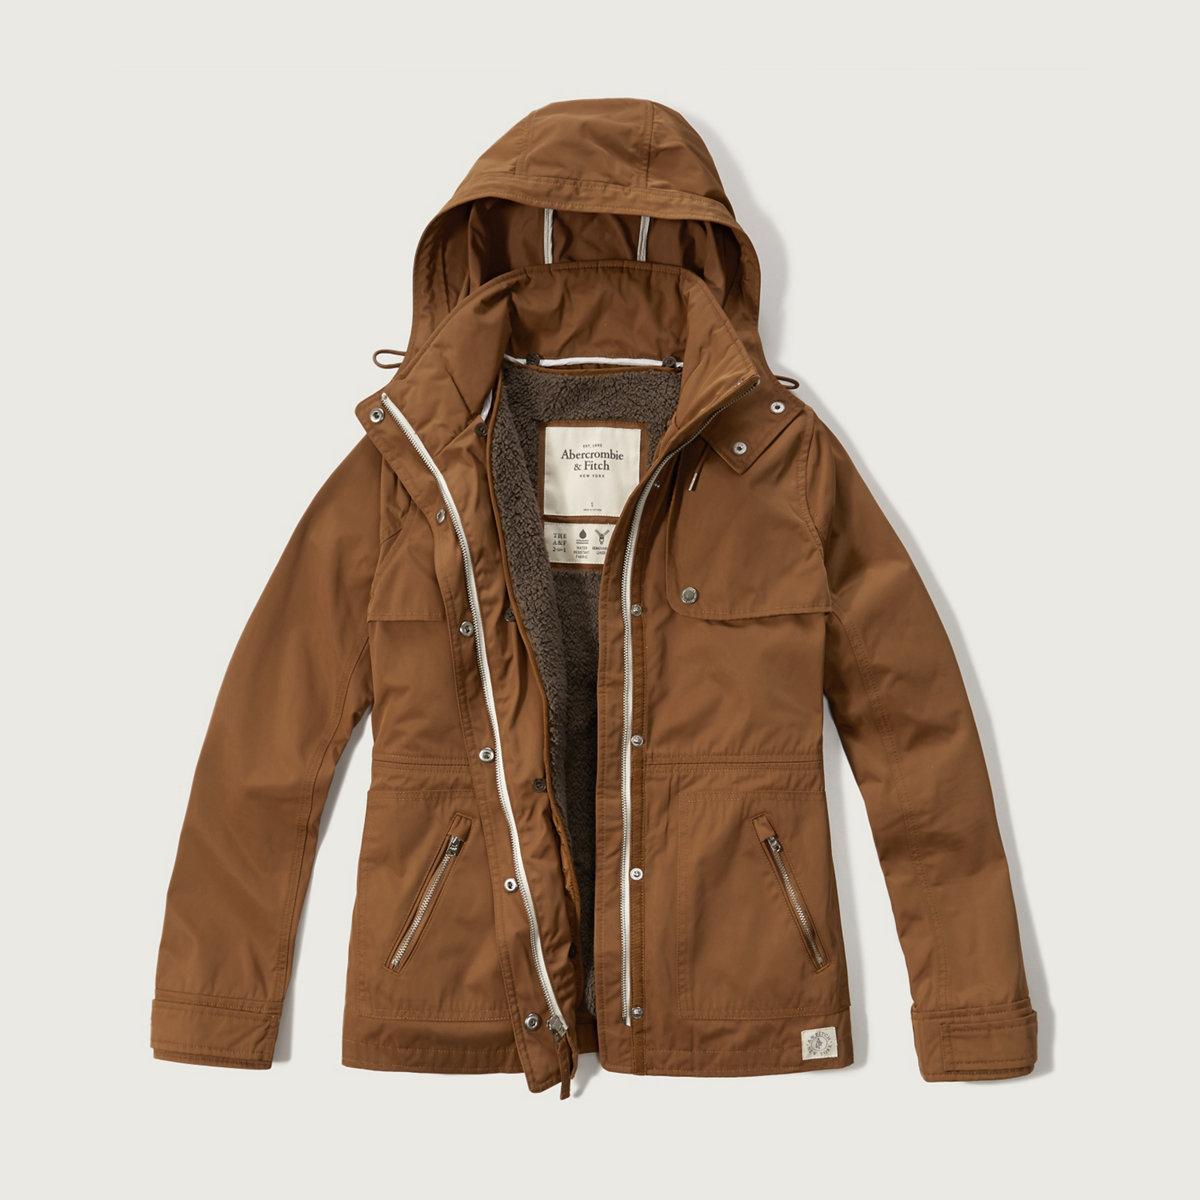 A&F 2-in-1 Nylon Jacket